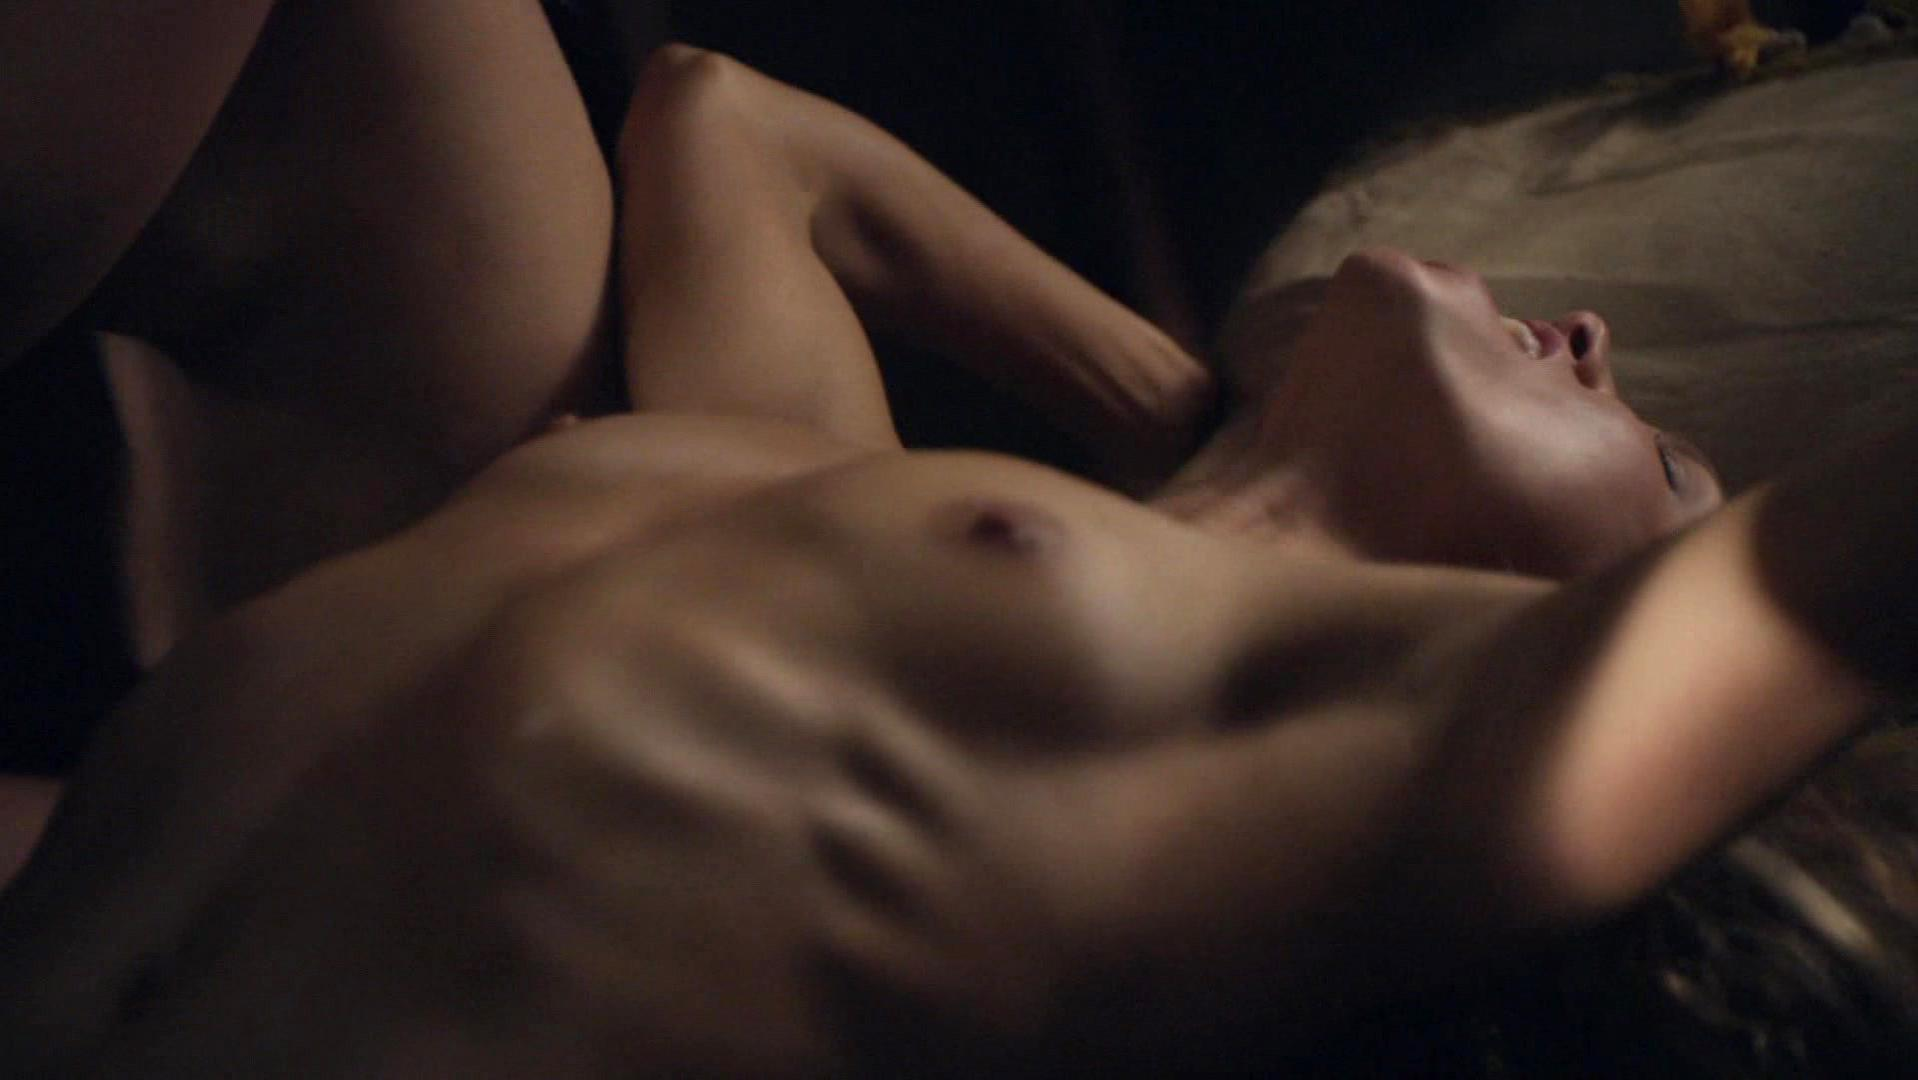 Ellen Hollman nude - Spartacus s03e01 (2013)